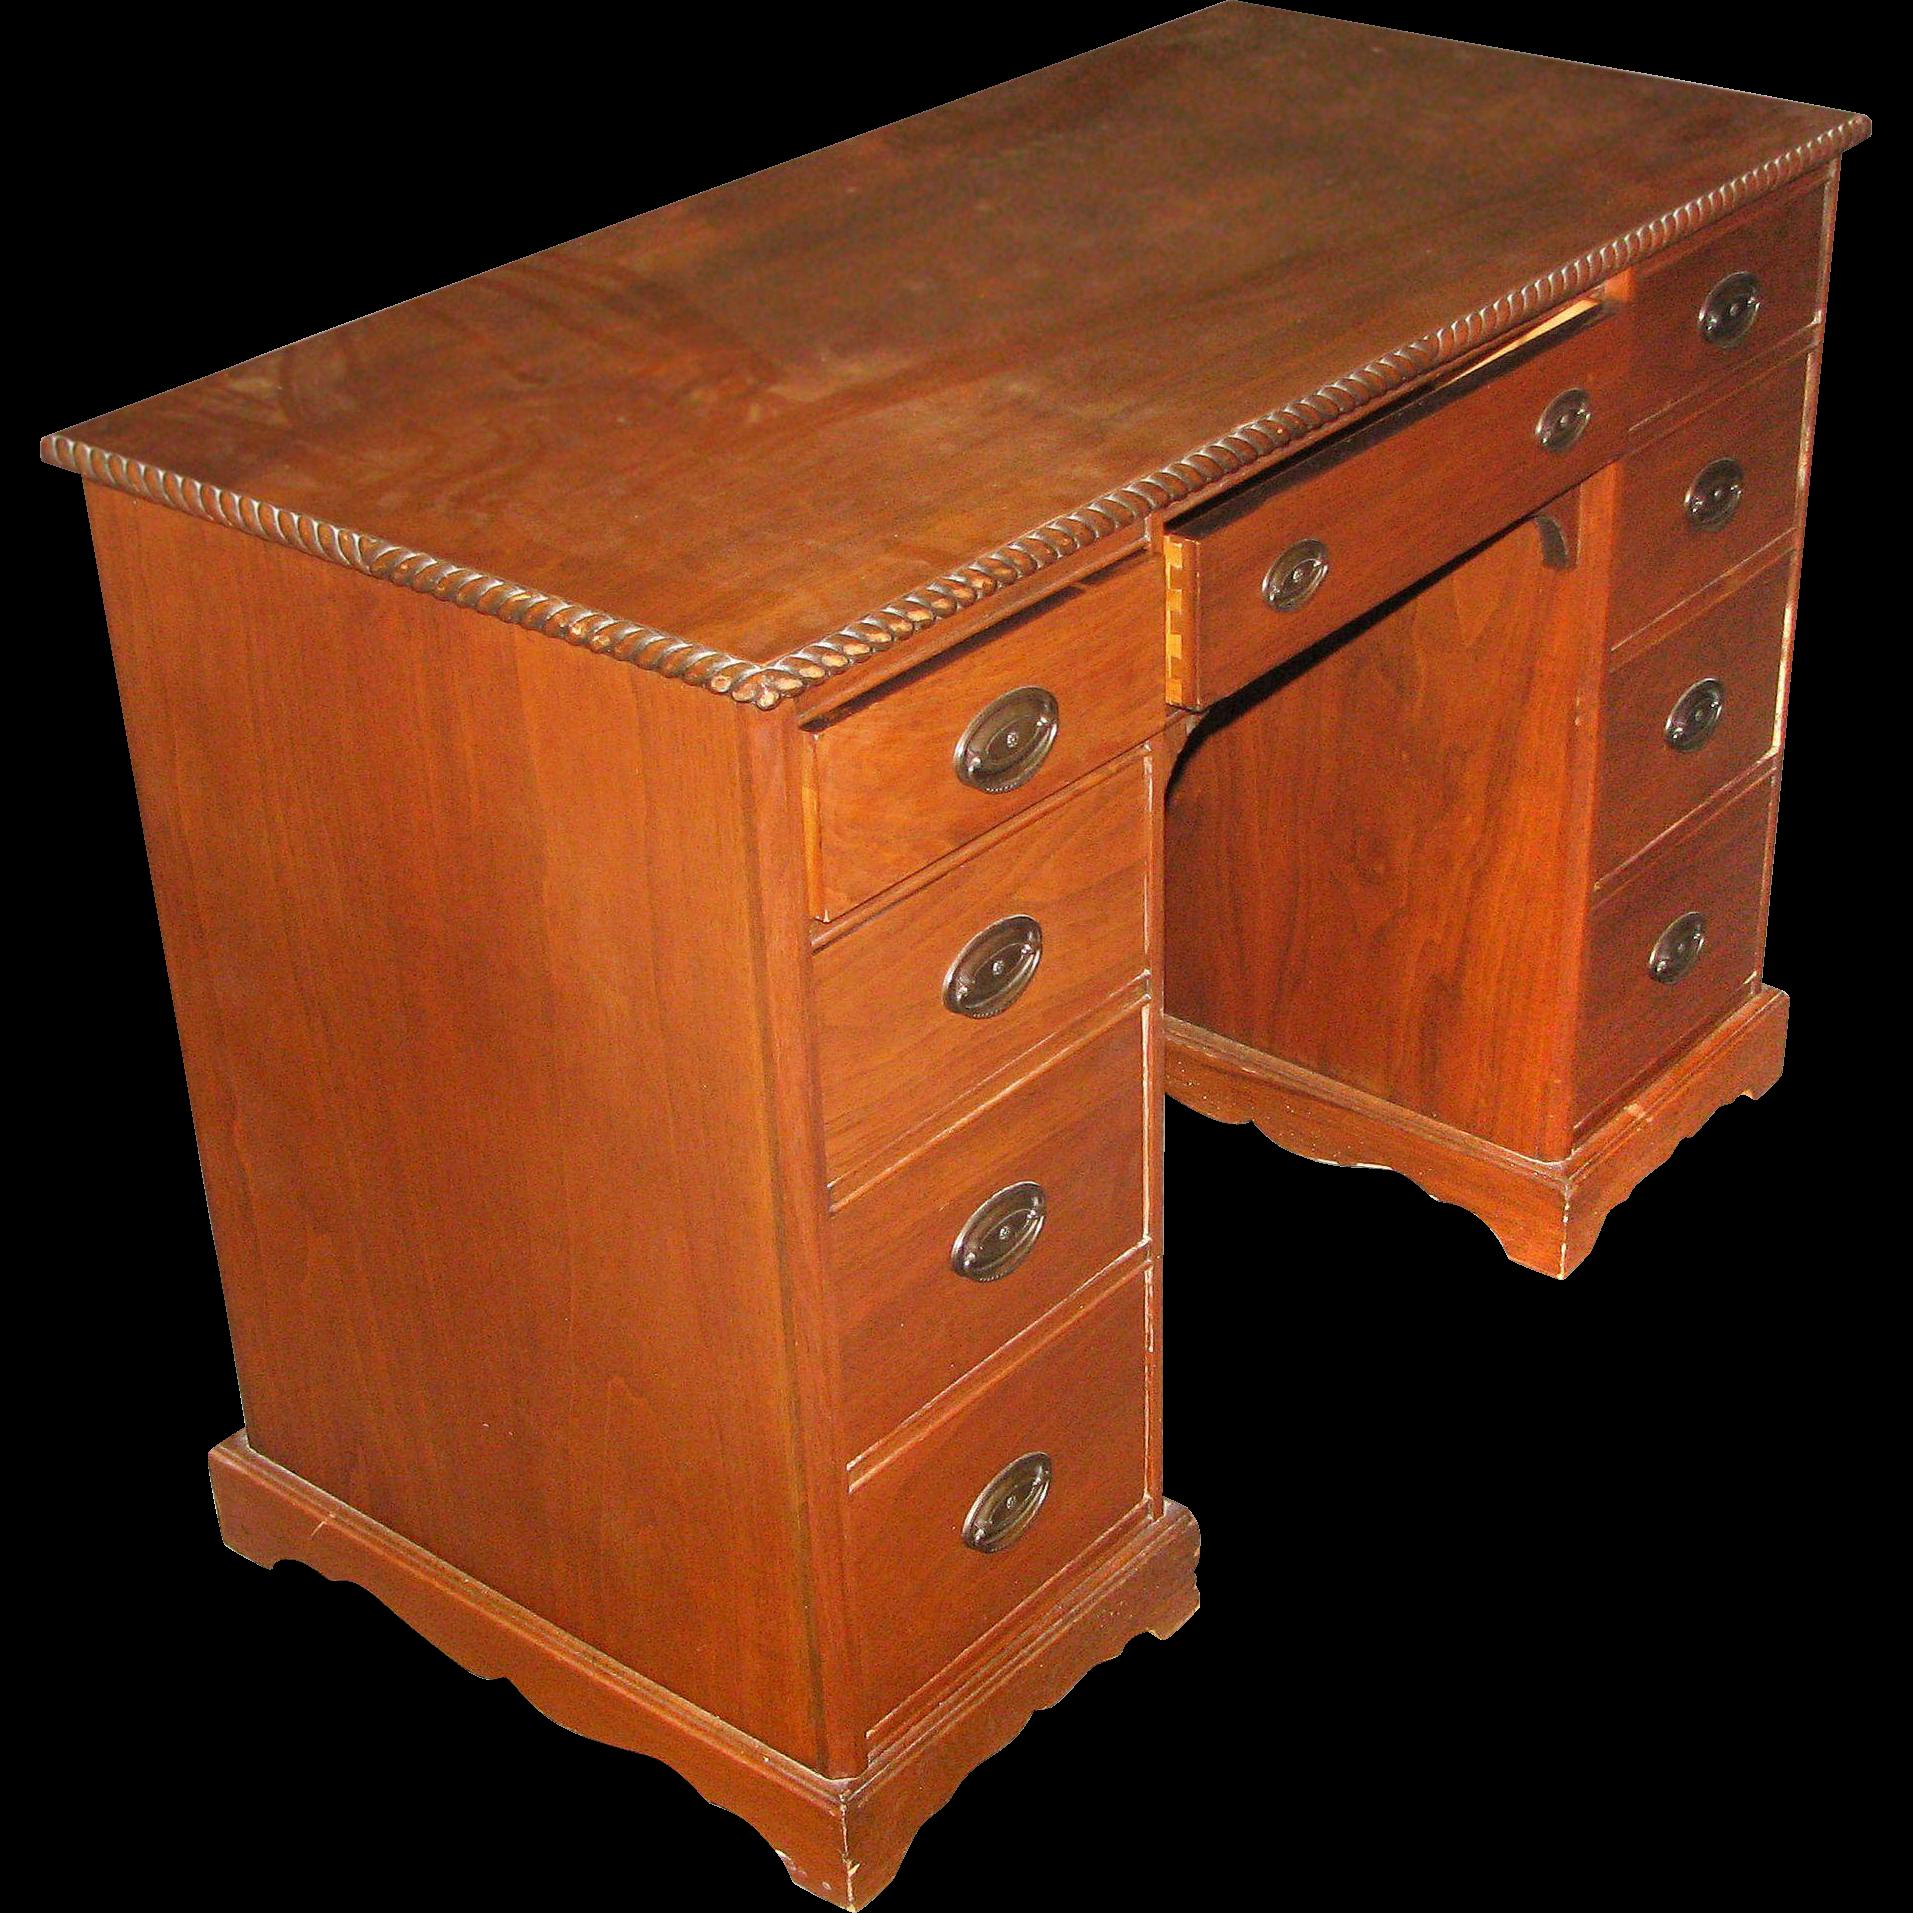 Vintage wood desk with rope detail